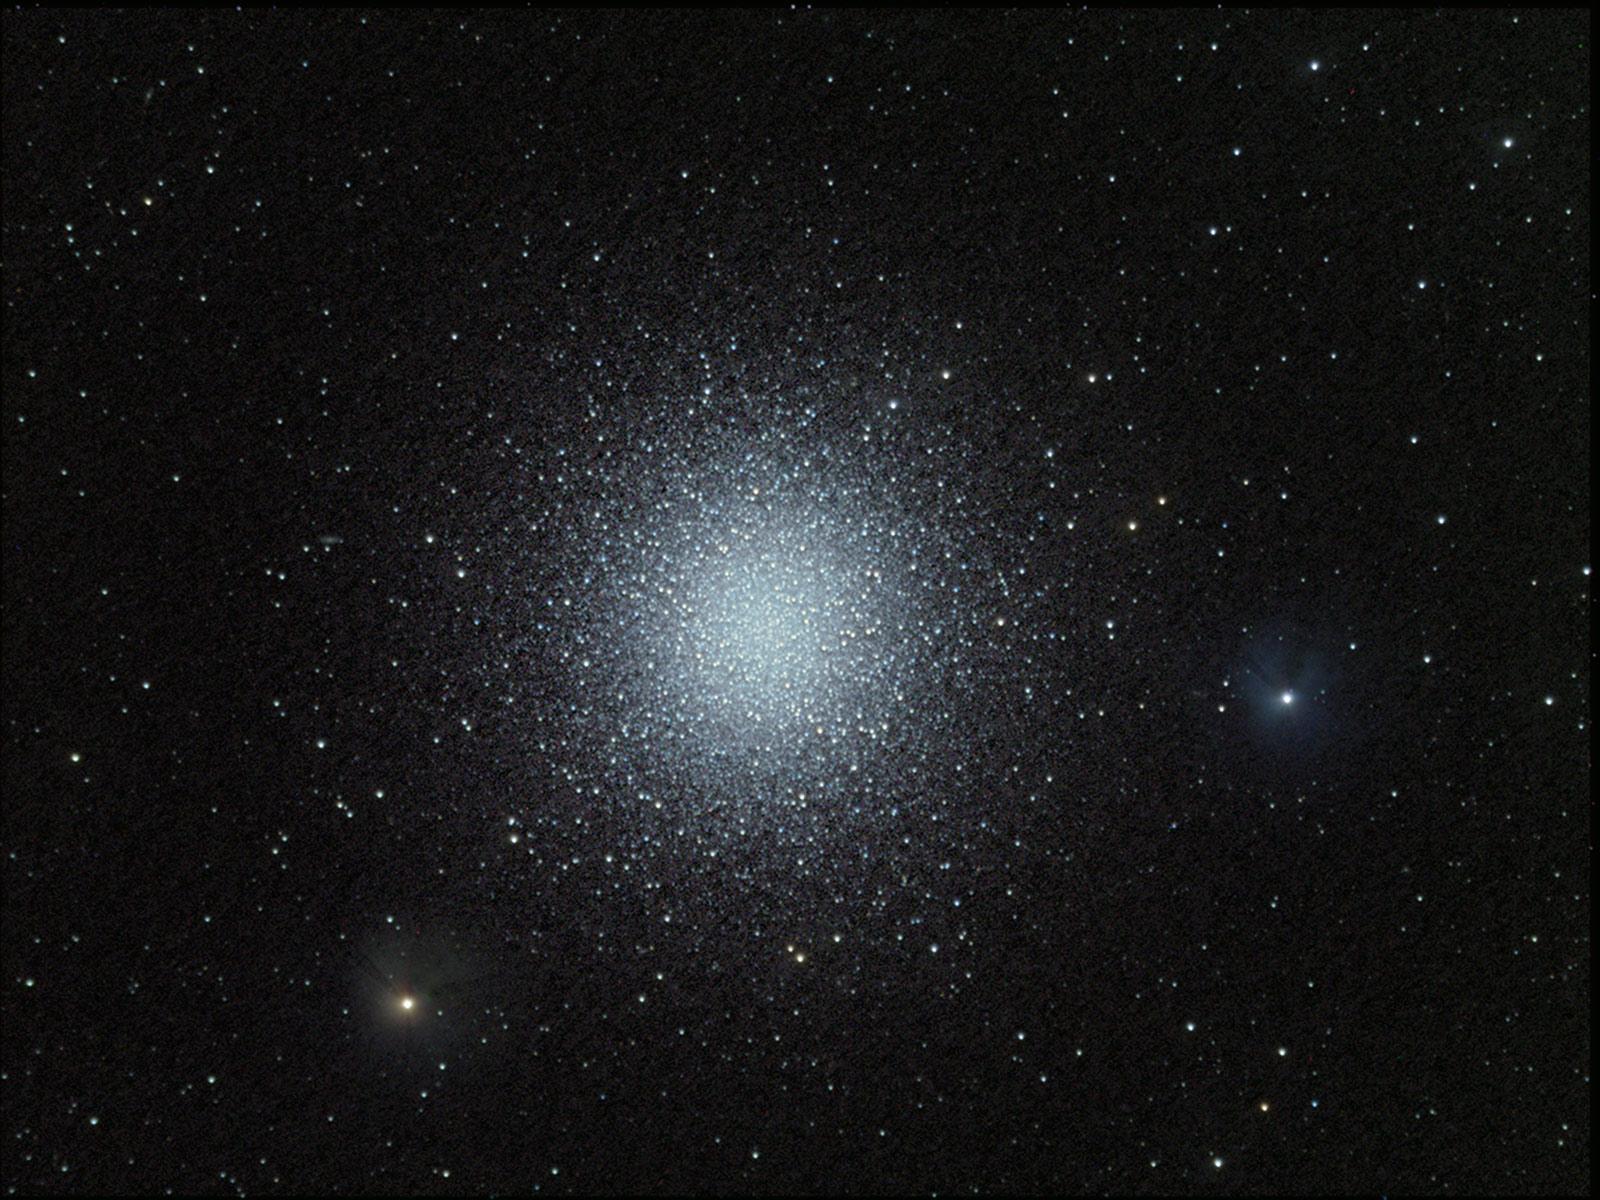 APOD 2004 May 11   M13 The Great Globular Cluster in 1600x1200